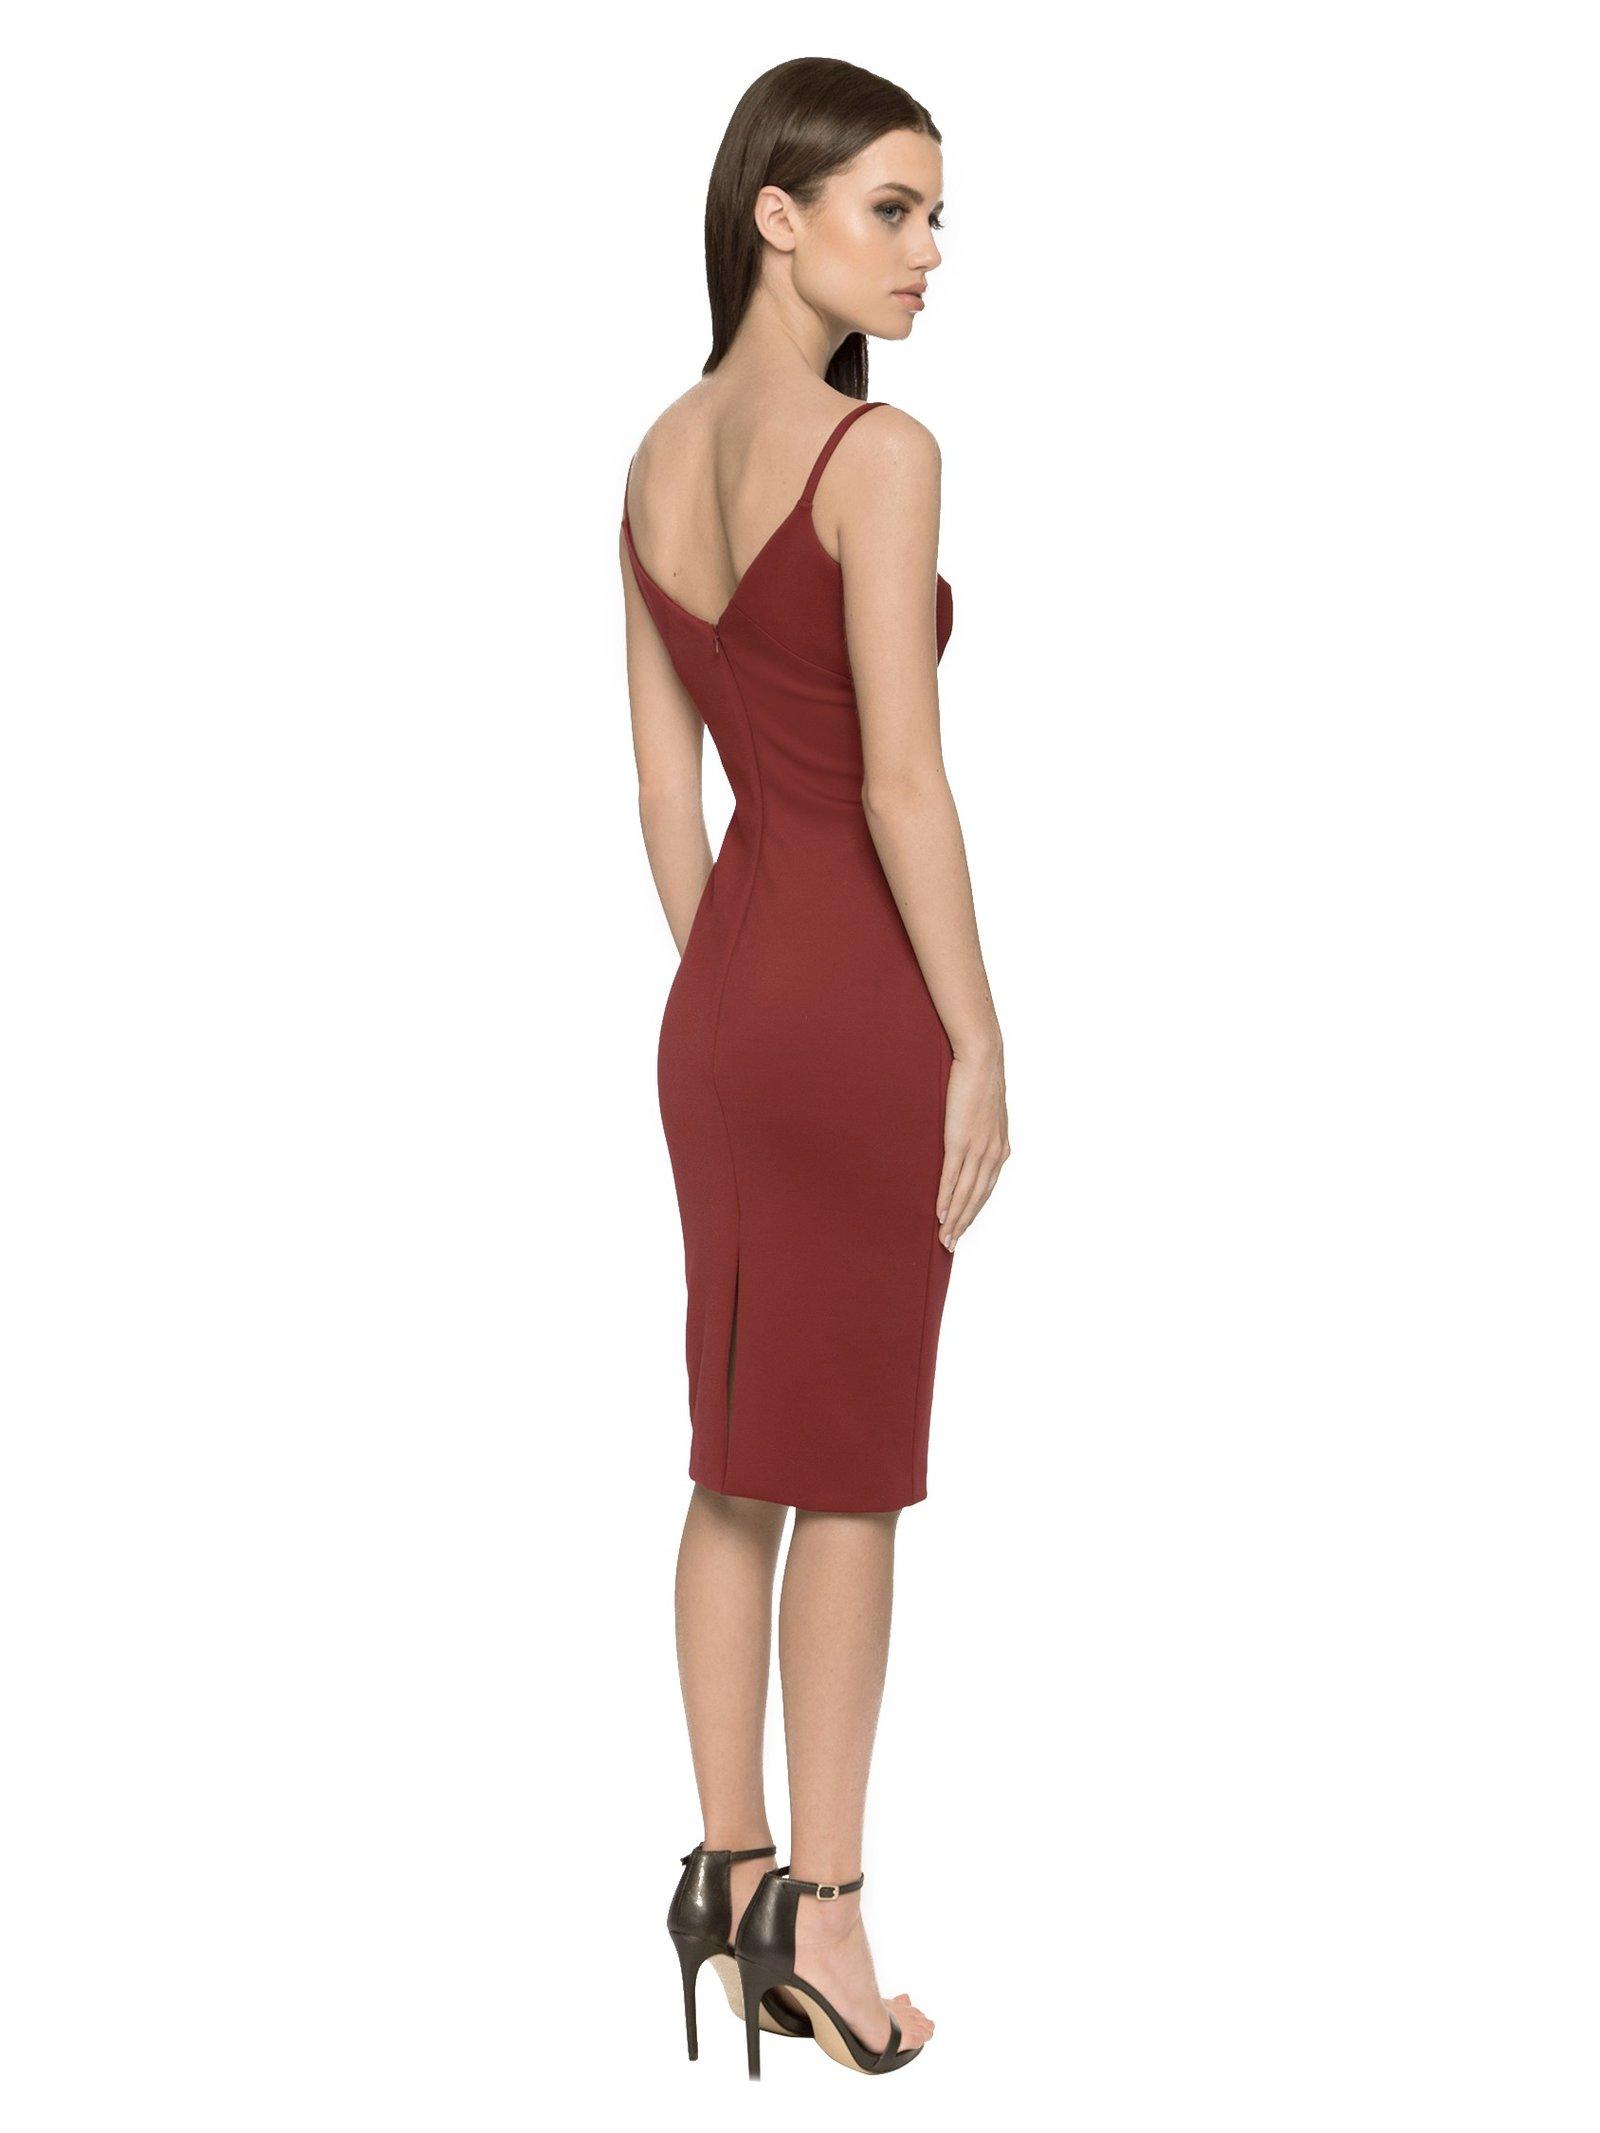 Aloura London Maddox Dress - Dark Red